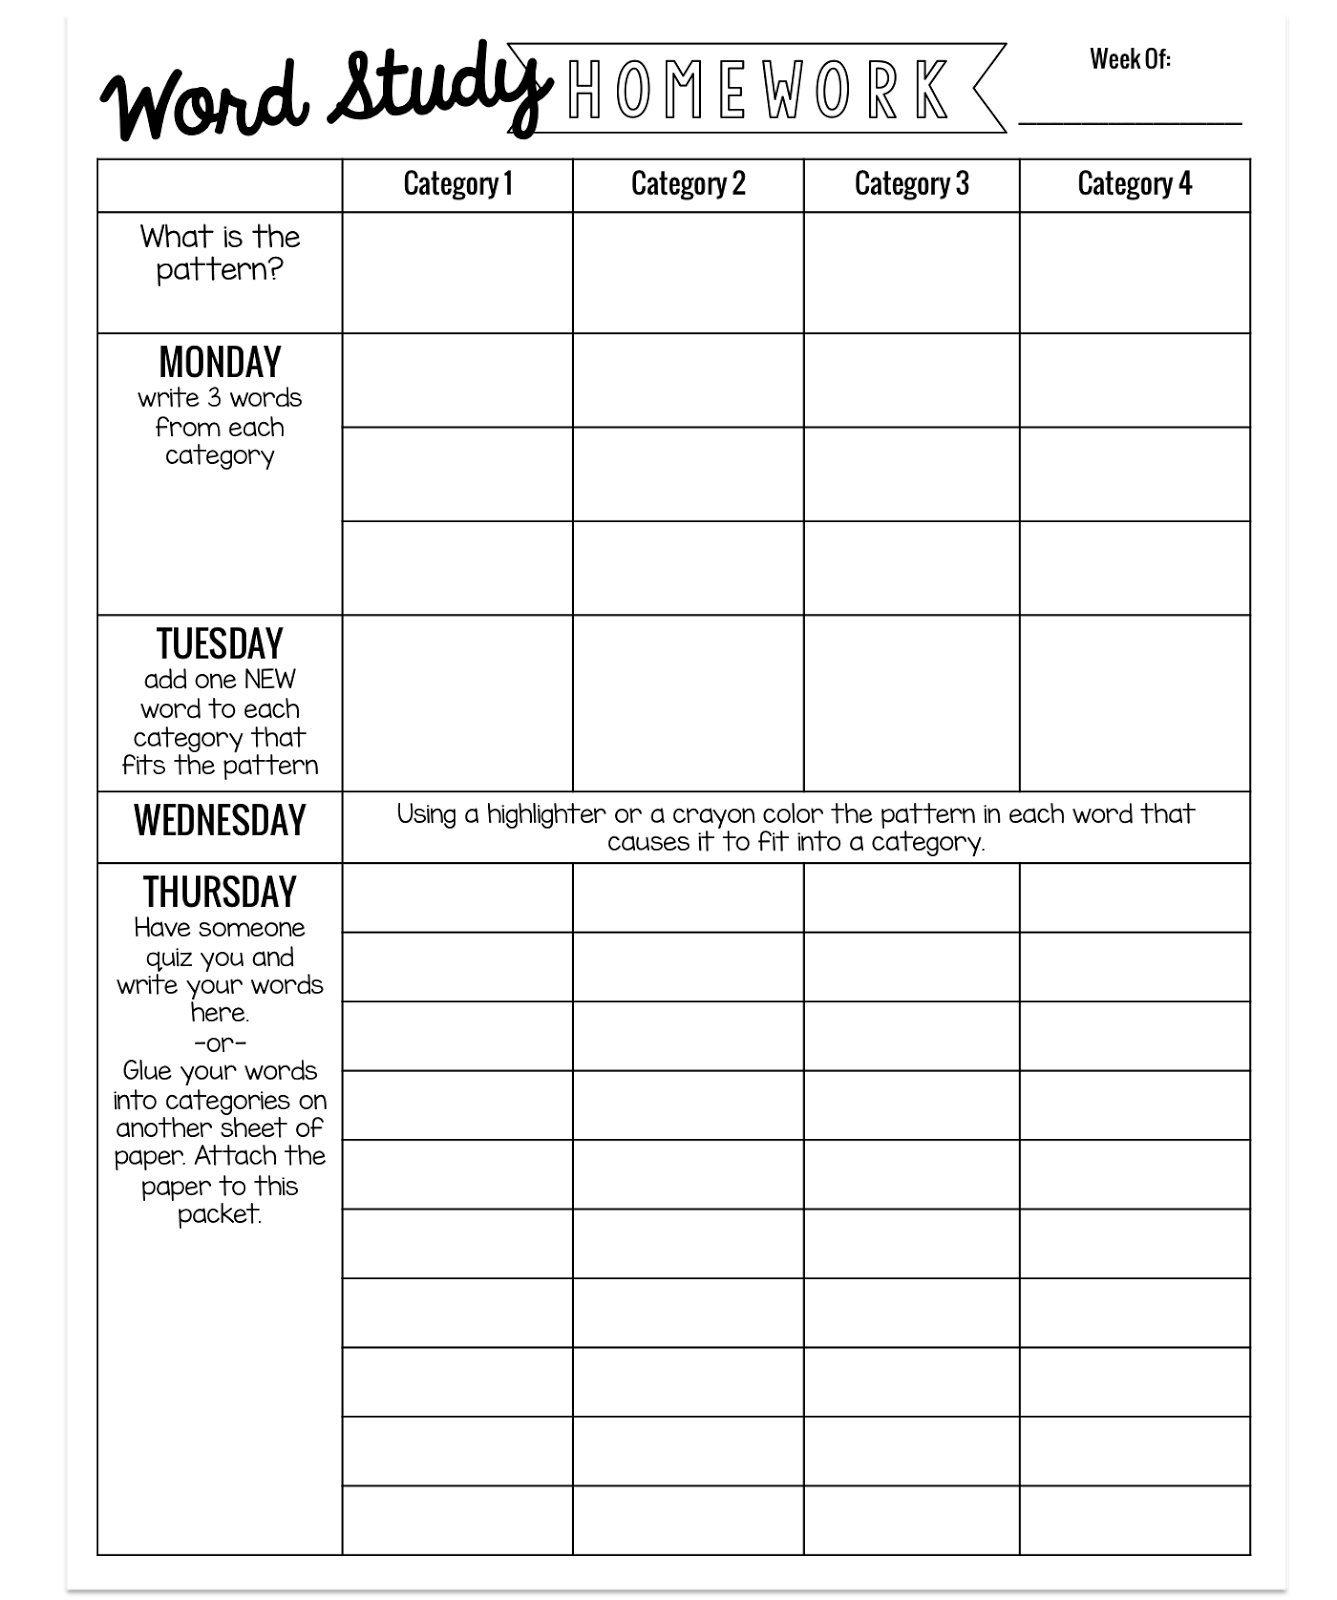 simple weekly word study homework secondgradesquad com pinterest